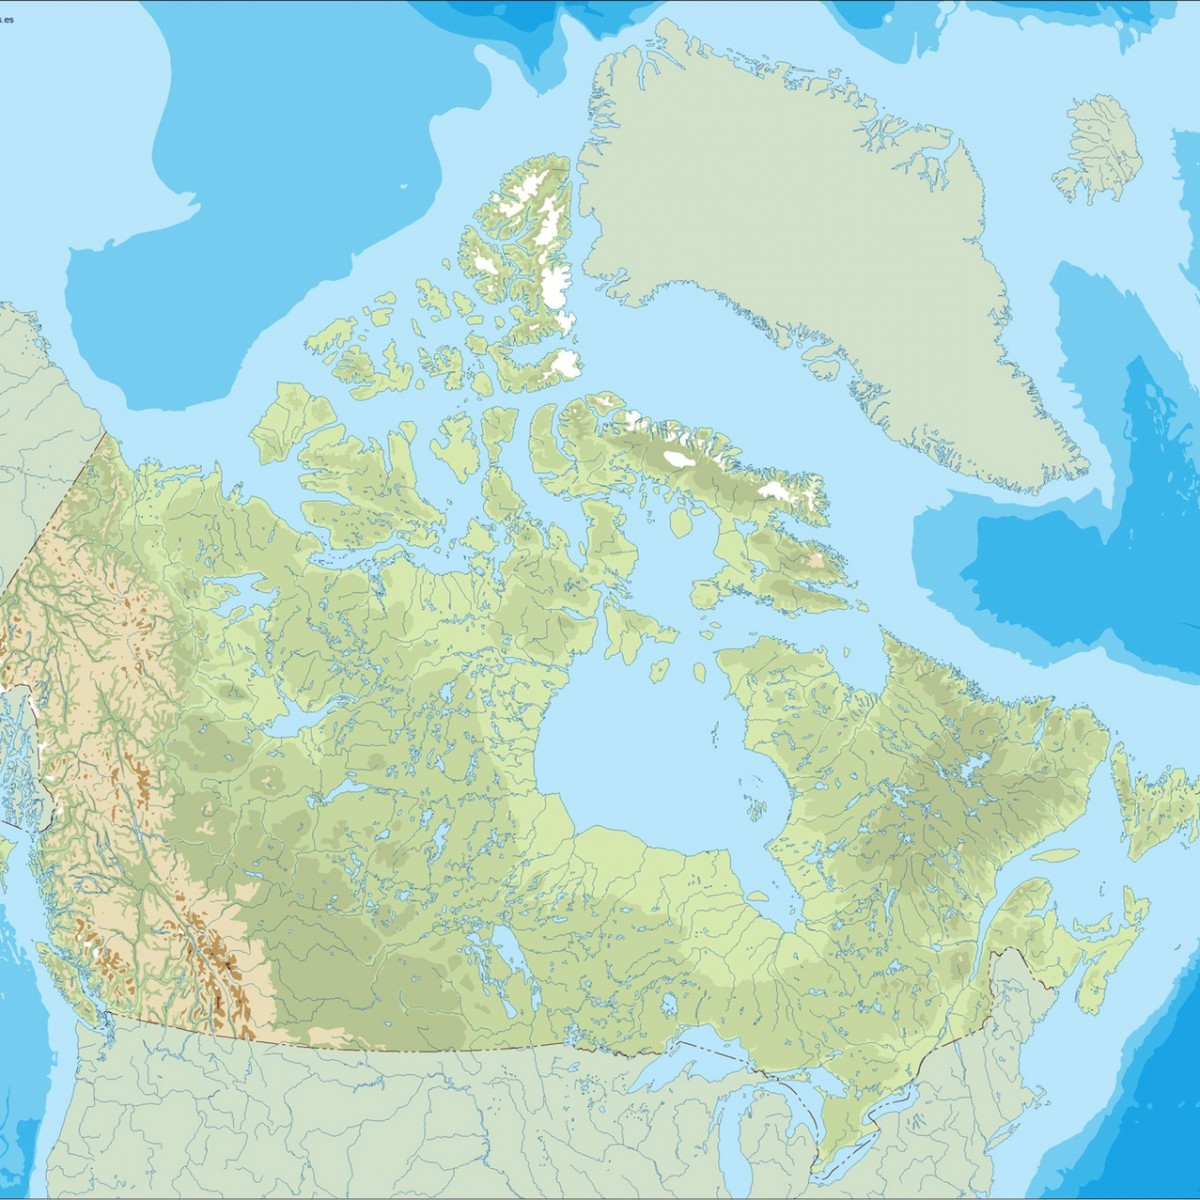 Map Of Canada Eps.Canada Illustrator Map Eps Illustrator Map